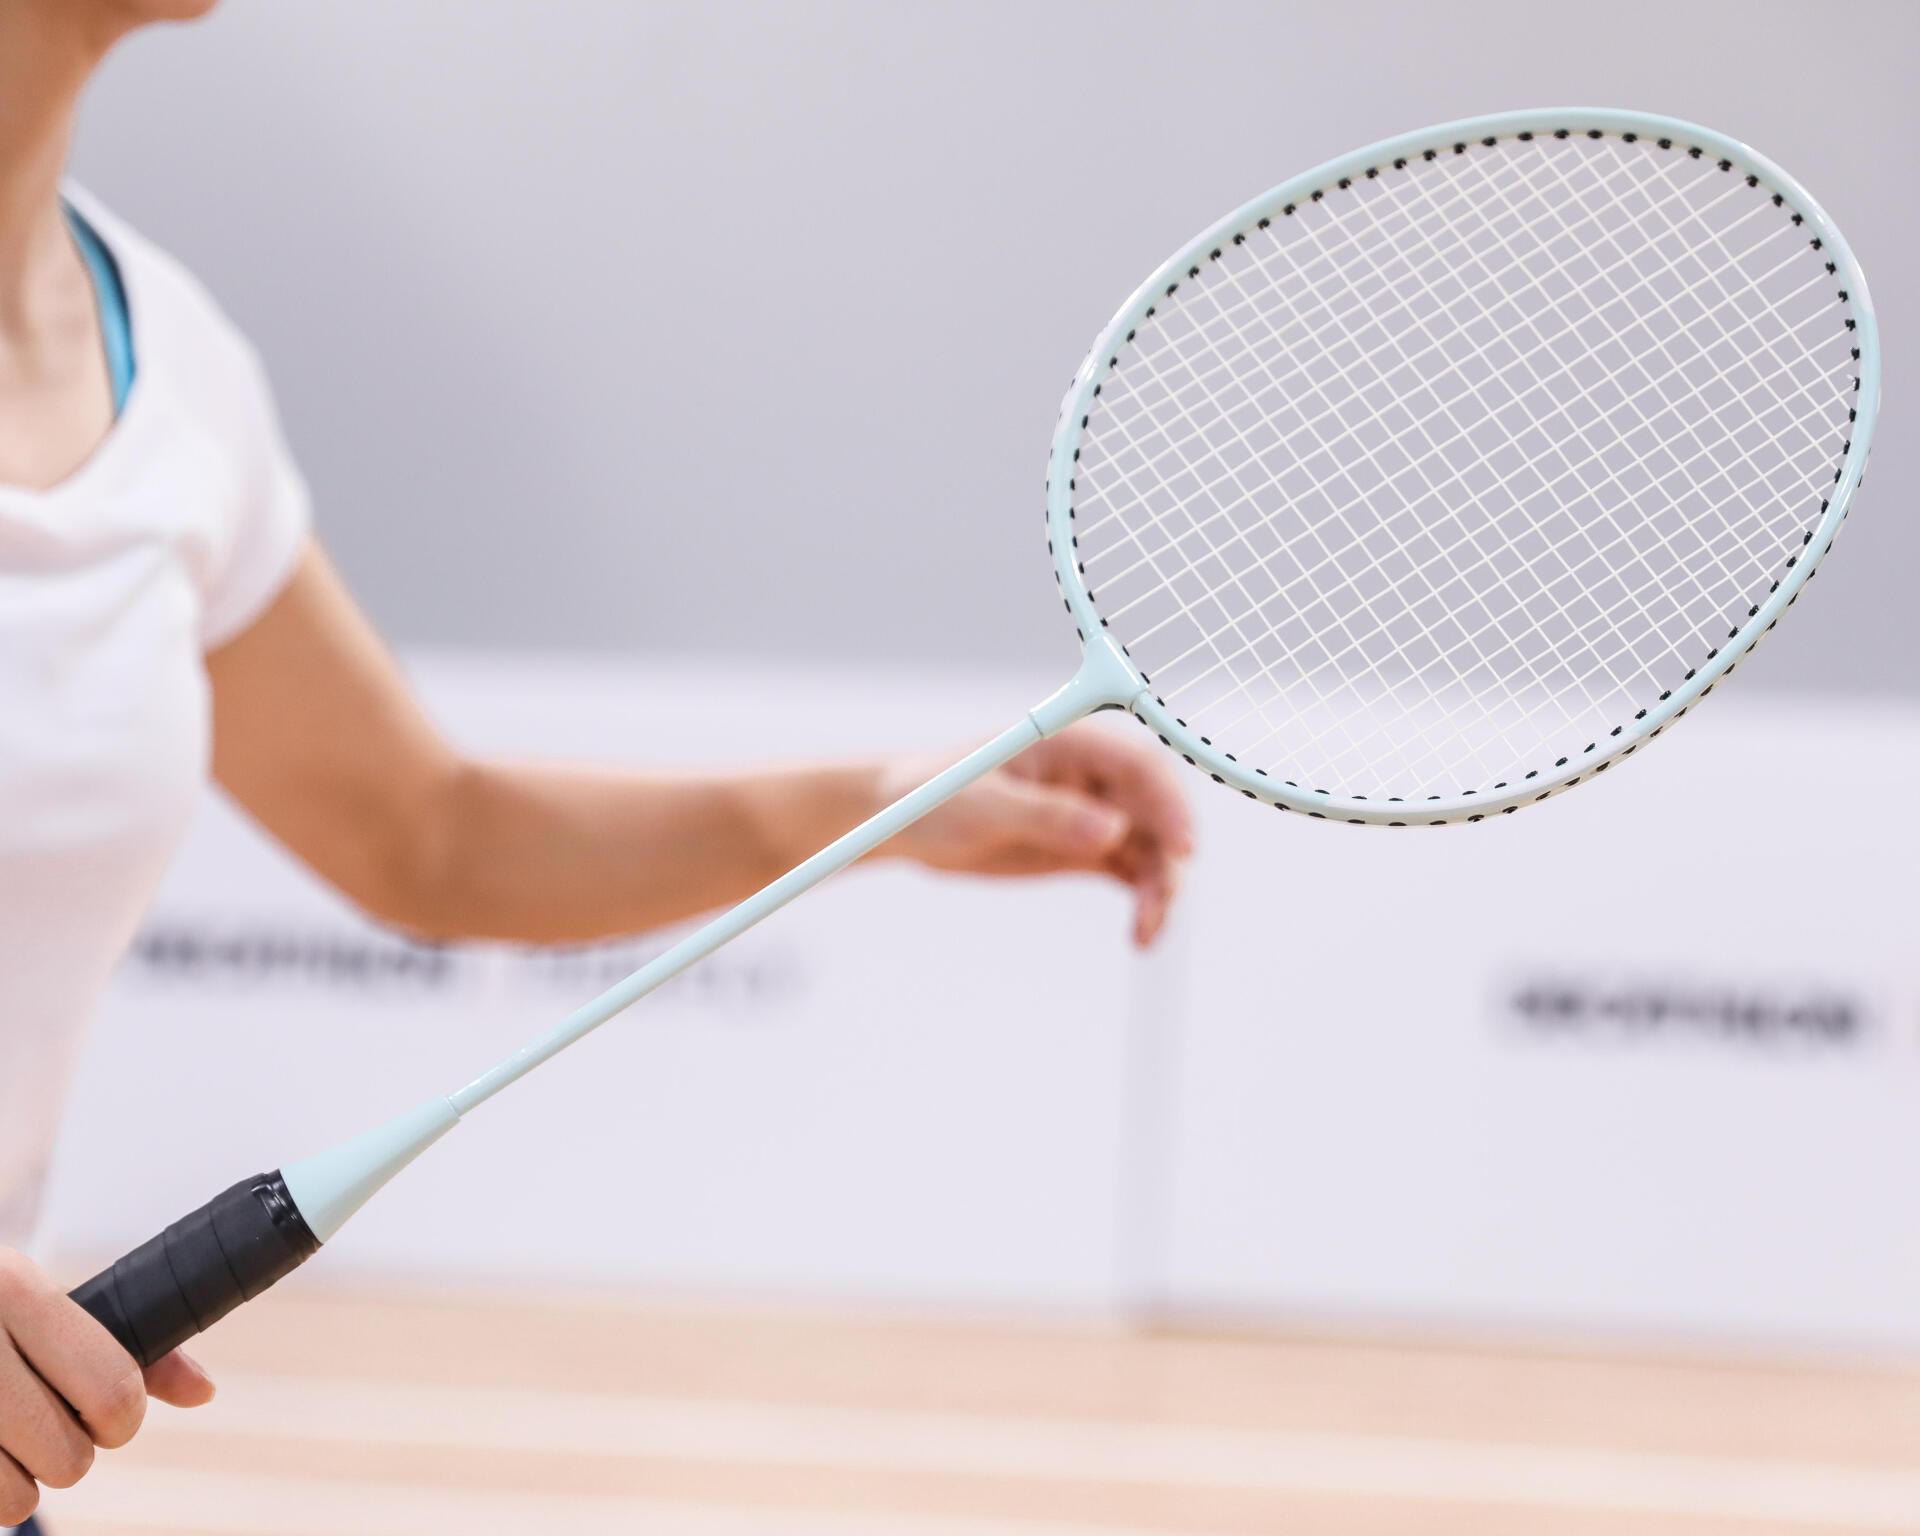 WEB dsk mob tab other  it TW 2019 Badminton  Justin